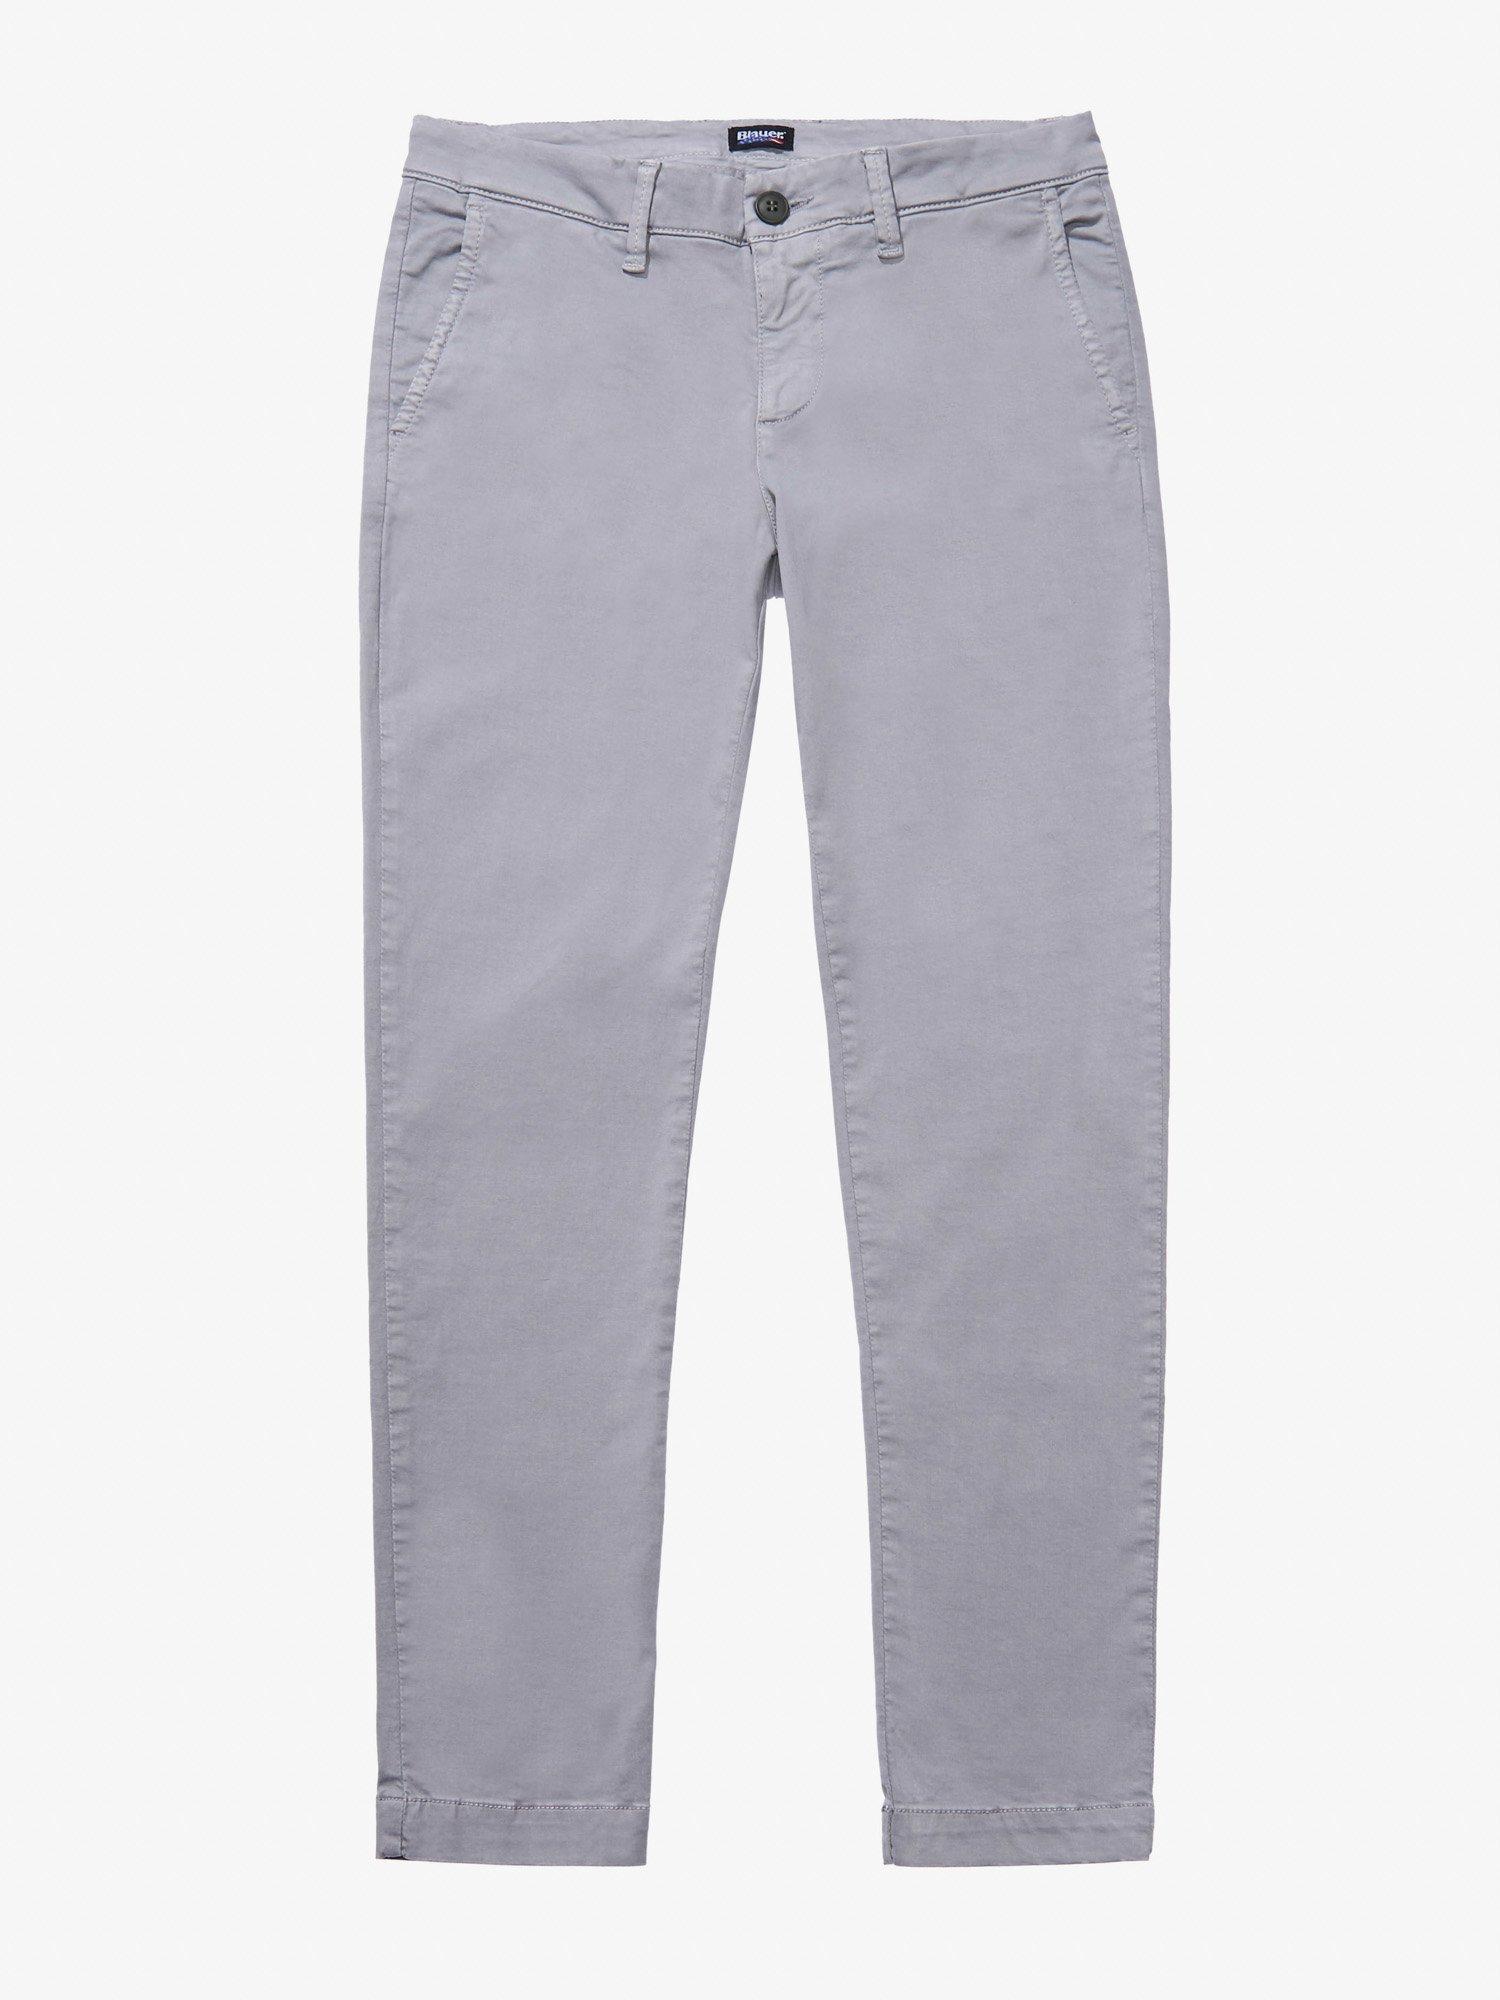 SATIN STRETCH PANTS - Blauer